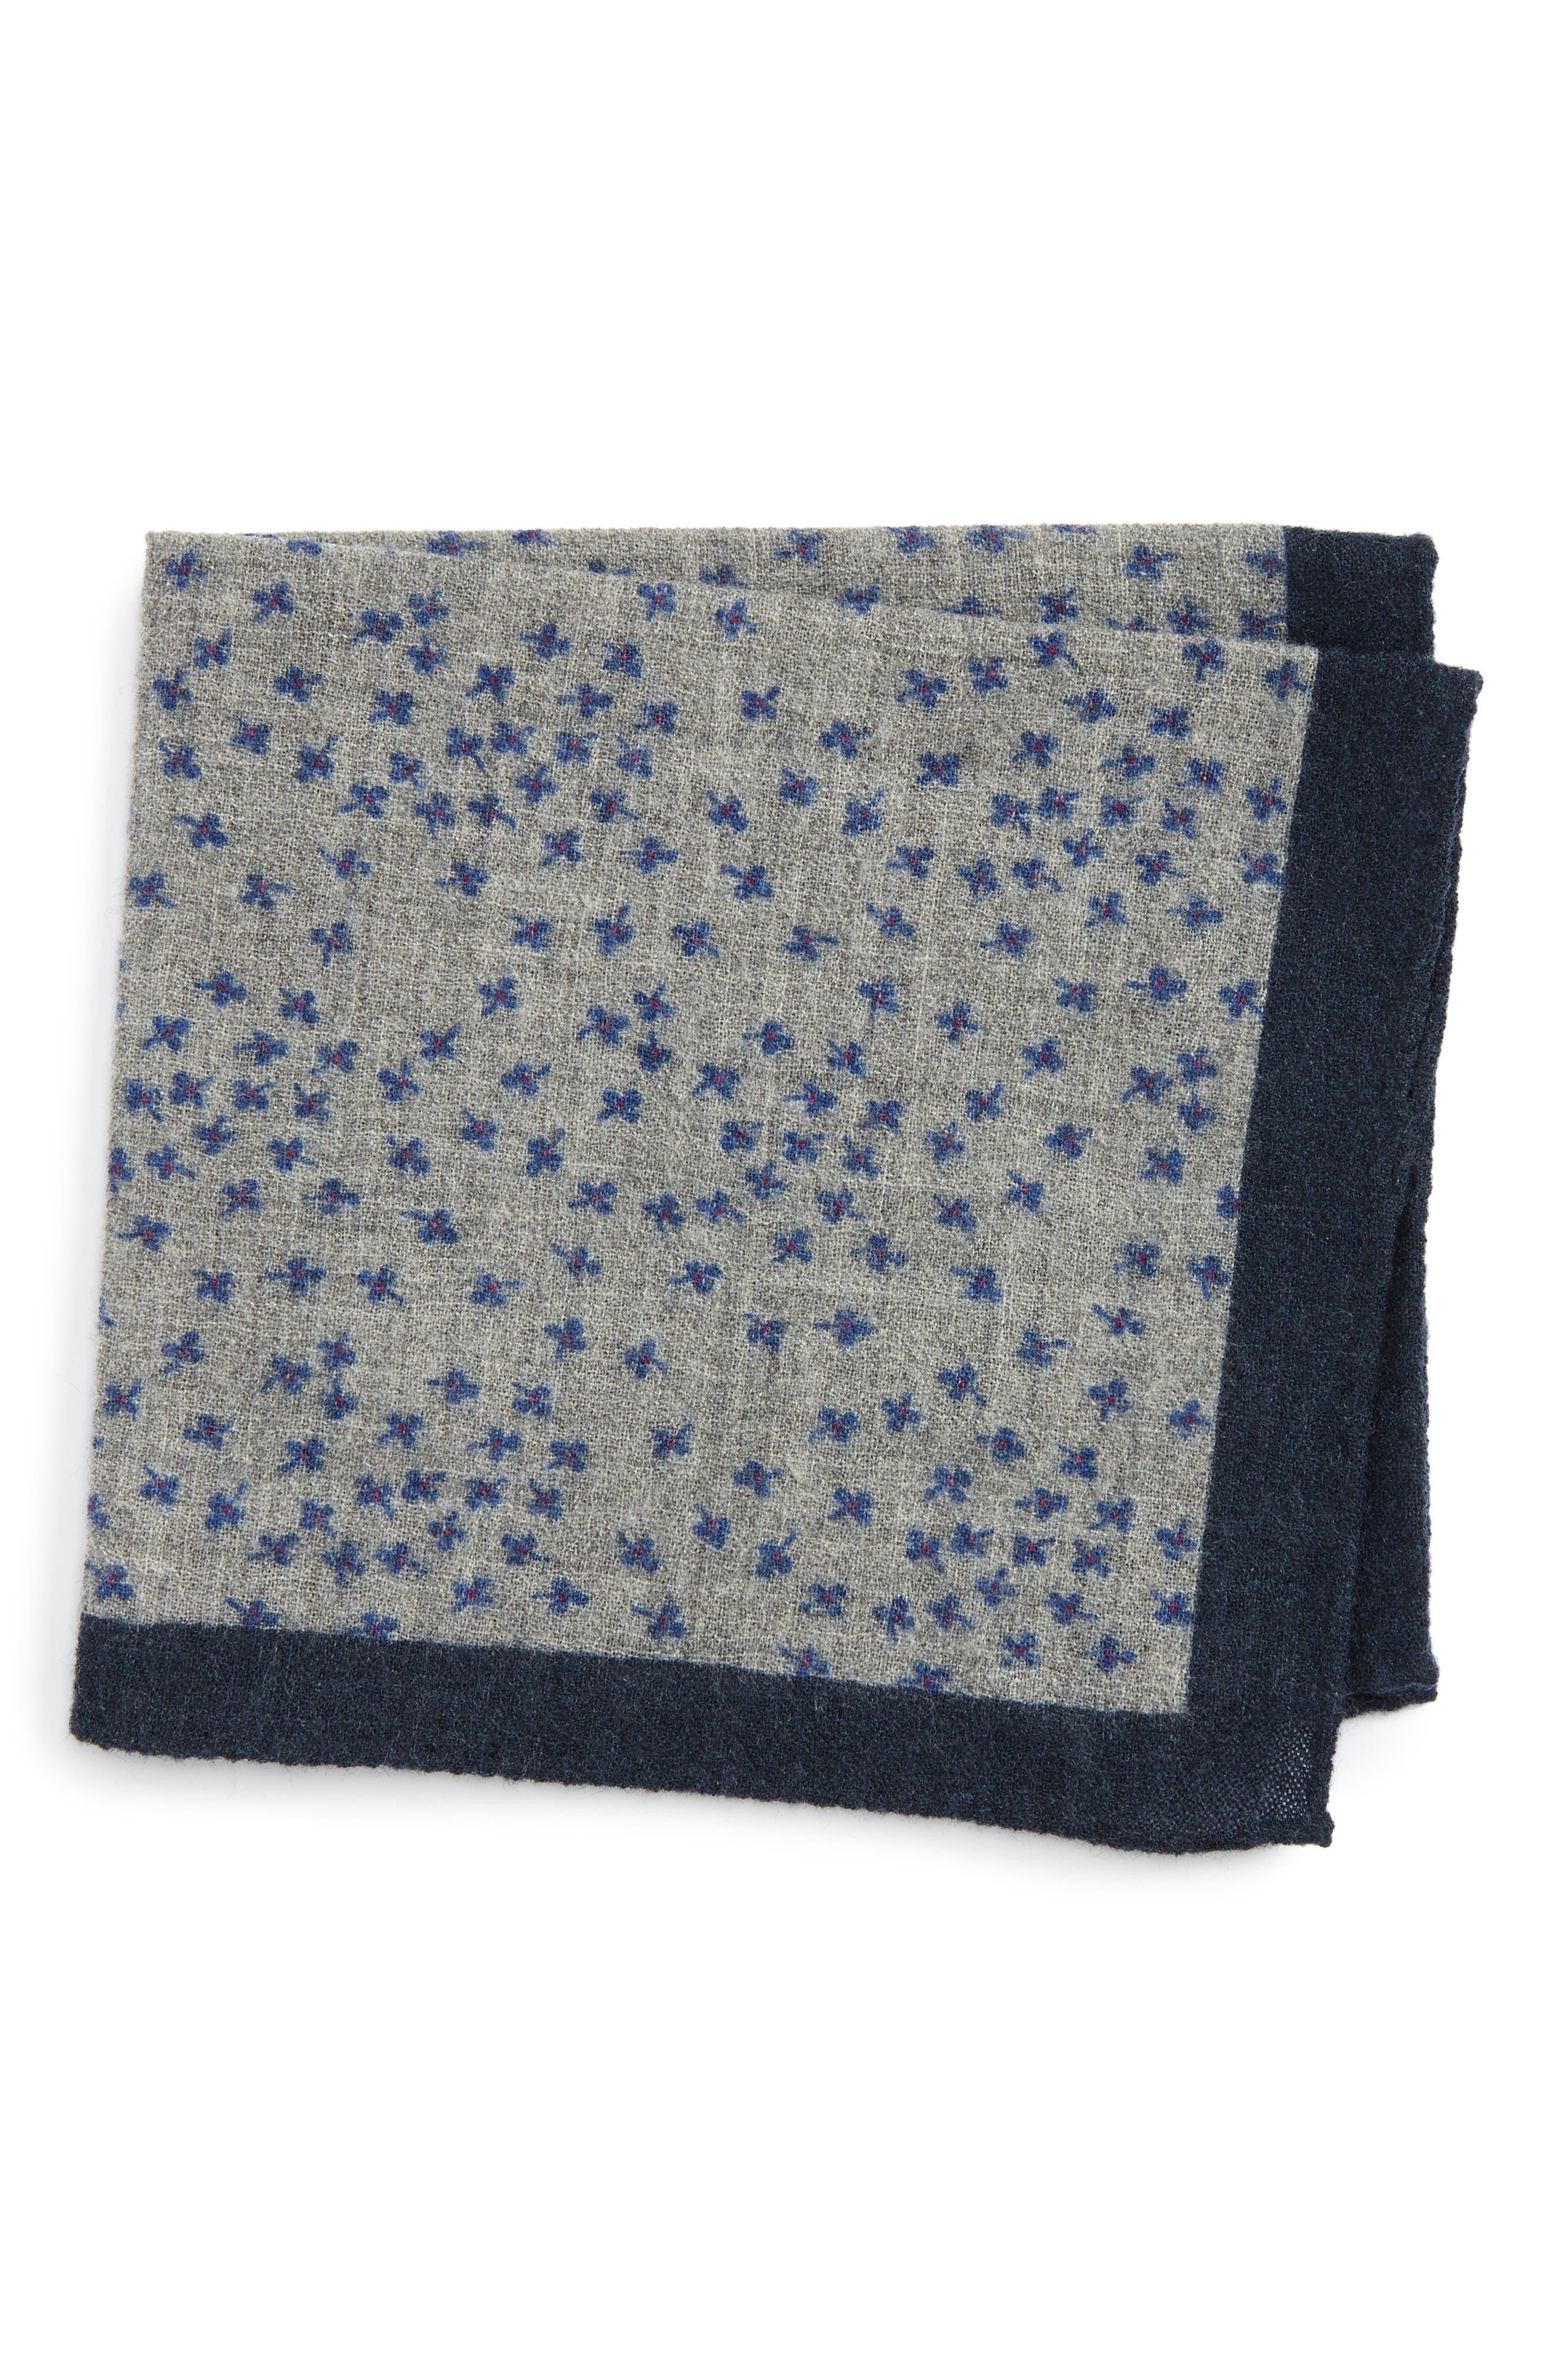 Patterned Wool Pocket Square,                             Main thumbnail 1, color,                             020